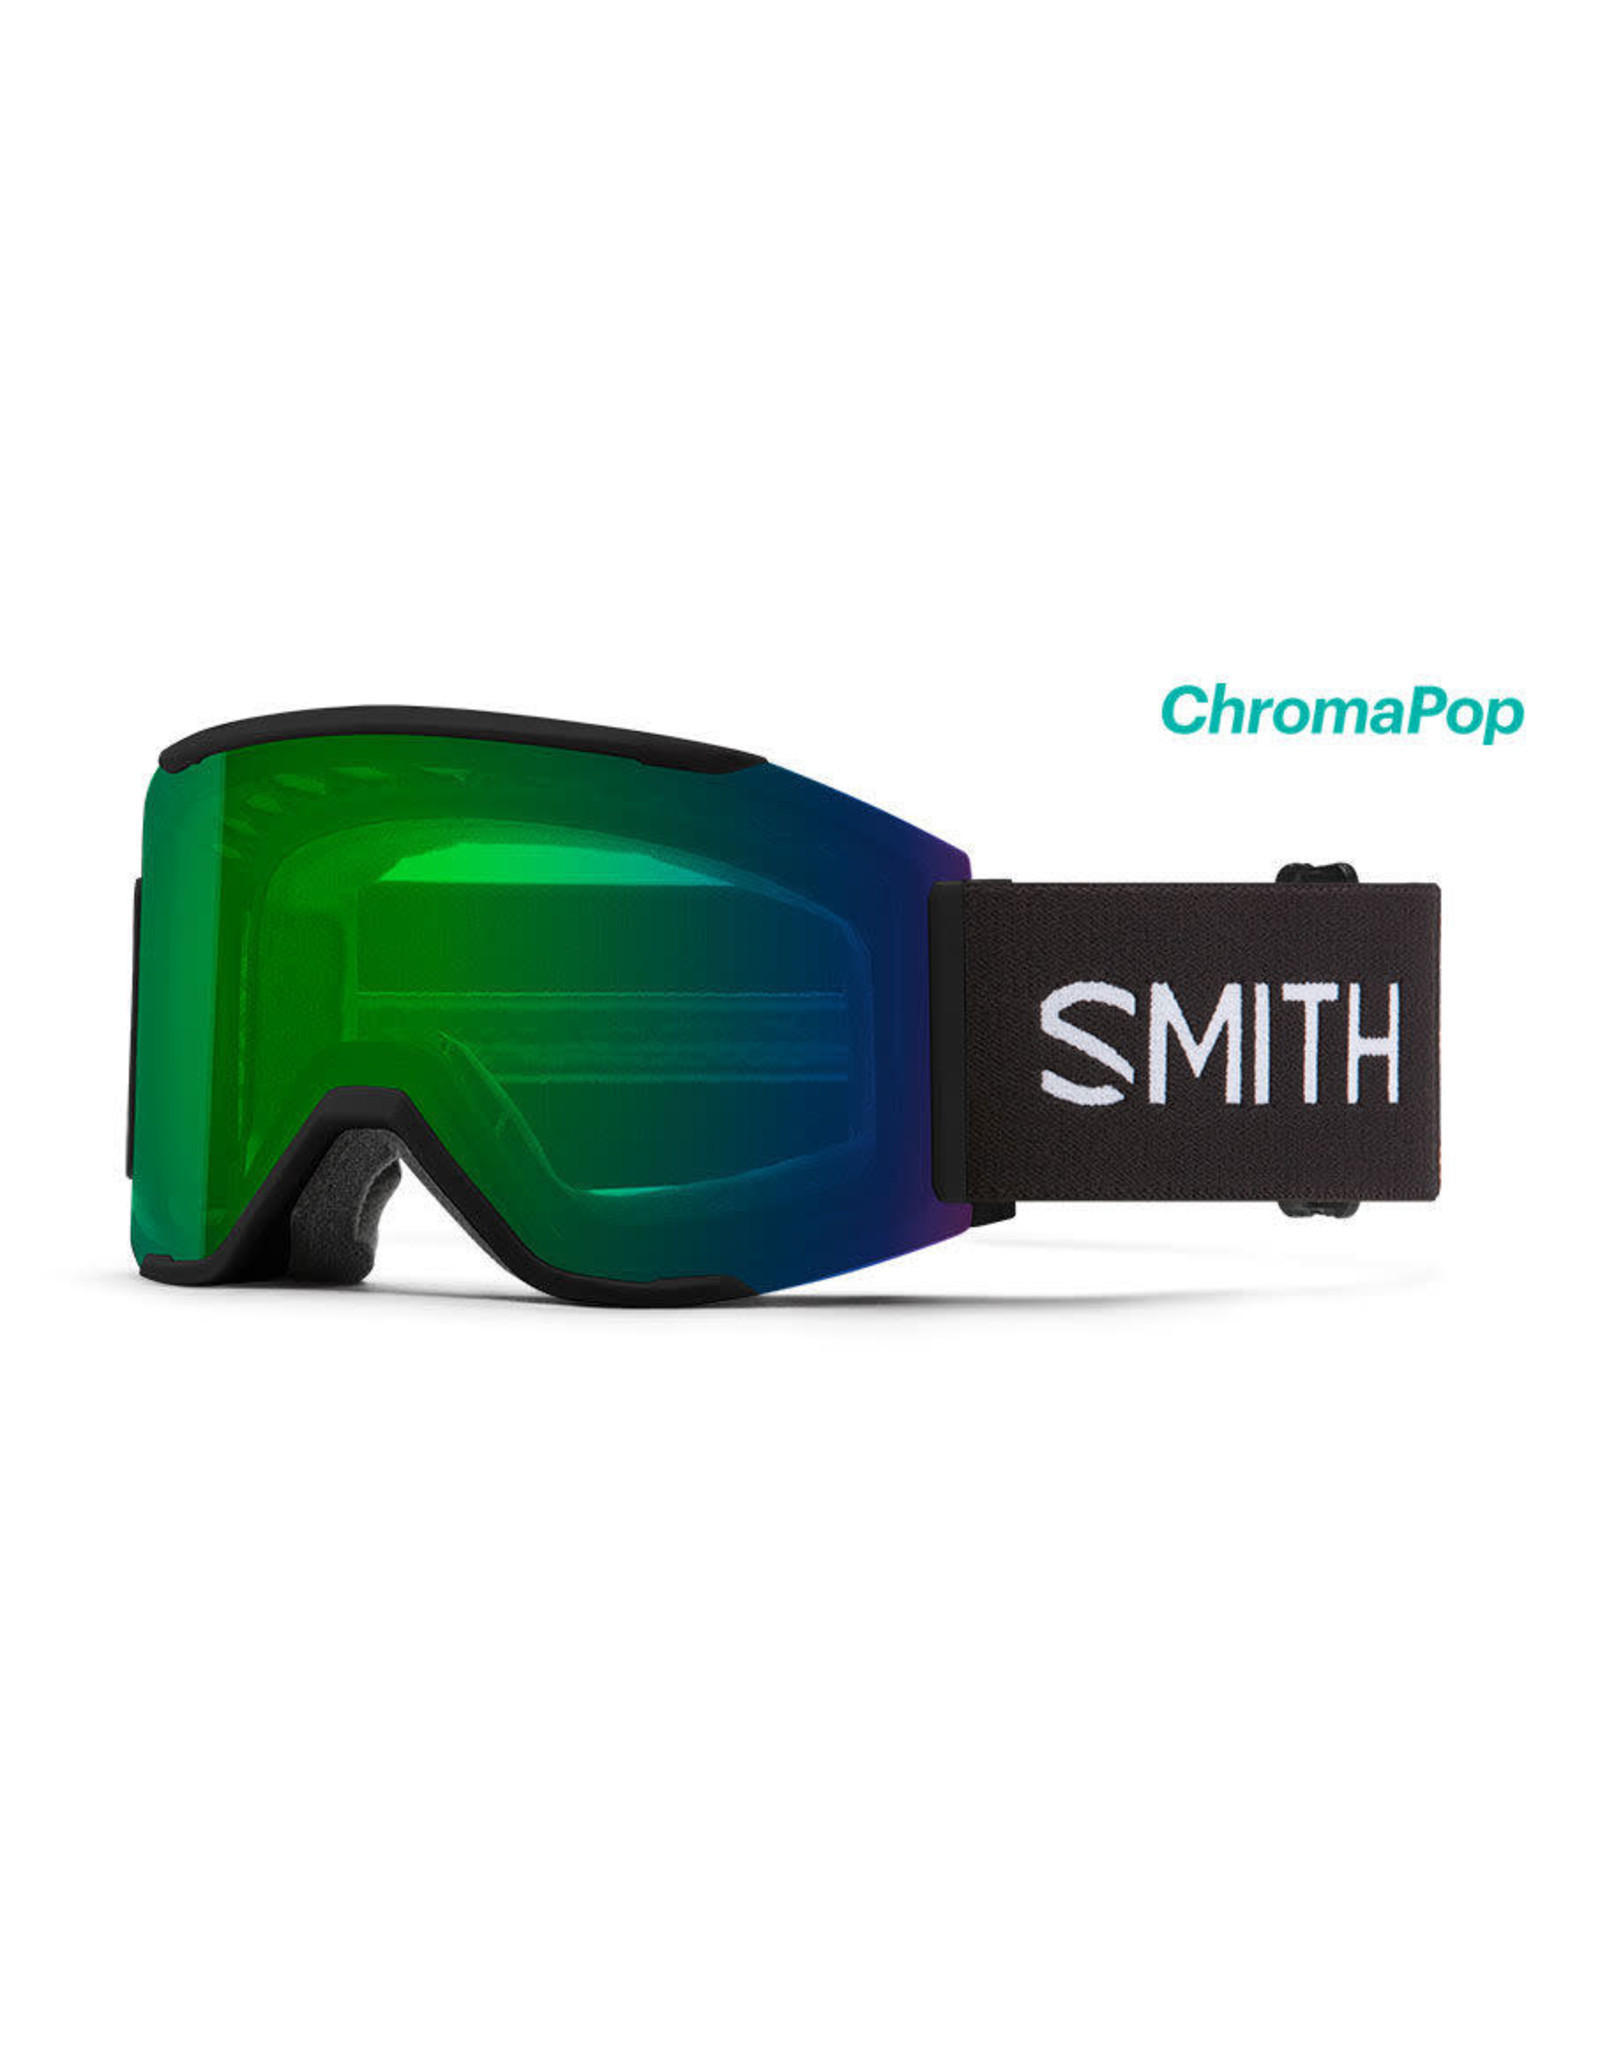 smith optics Smith Squad Mag Goggles - Chromapop Everyday Green - Black